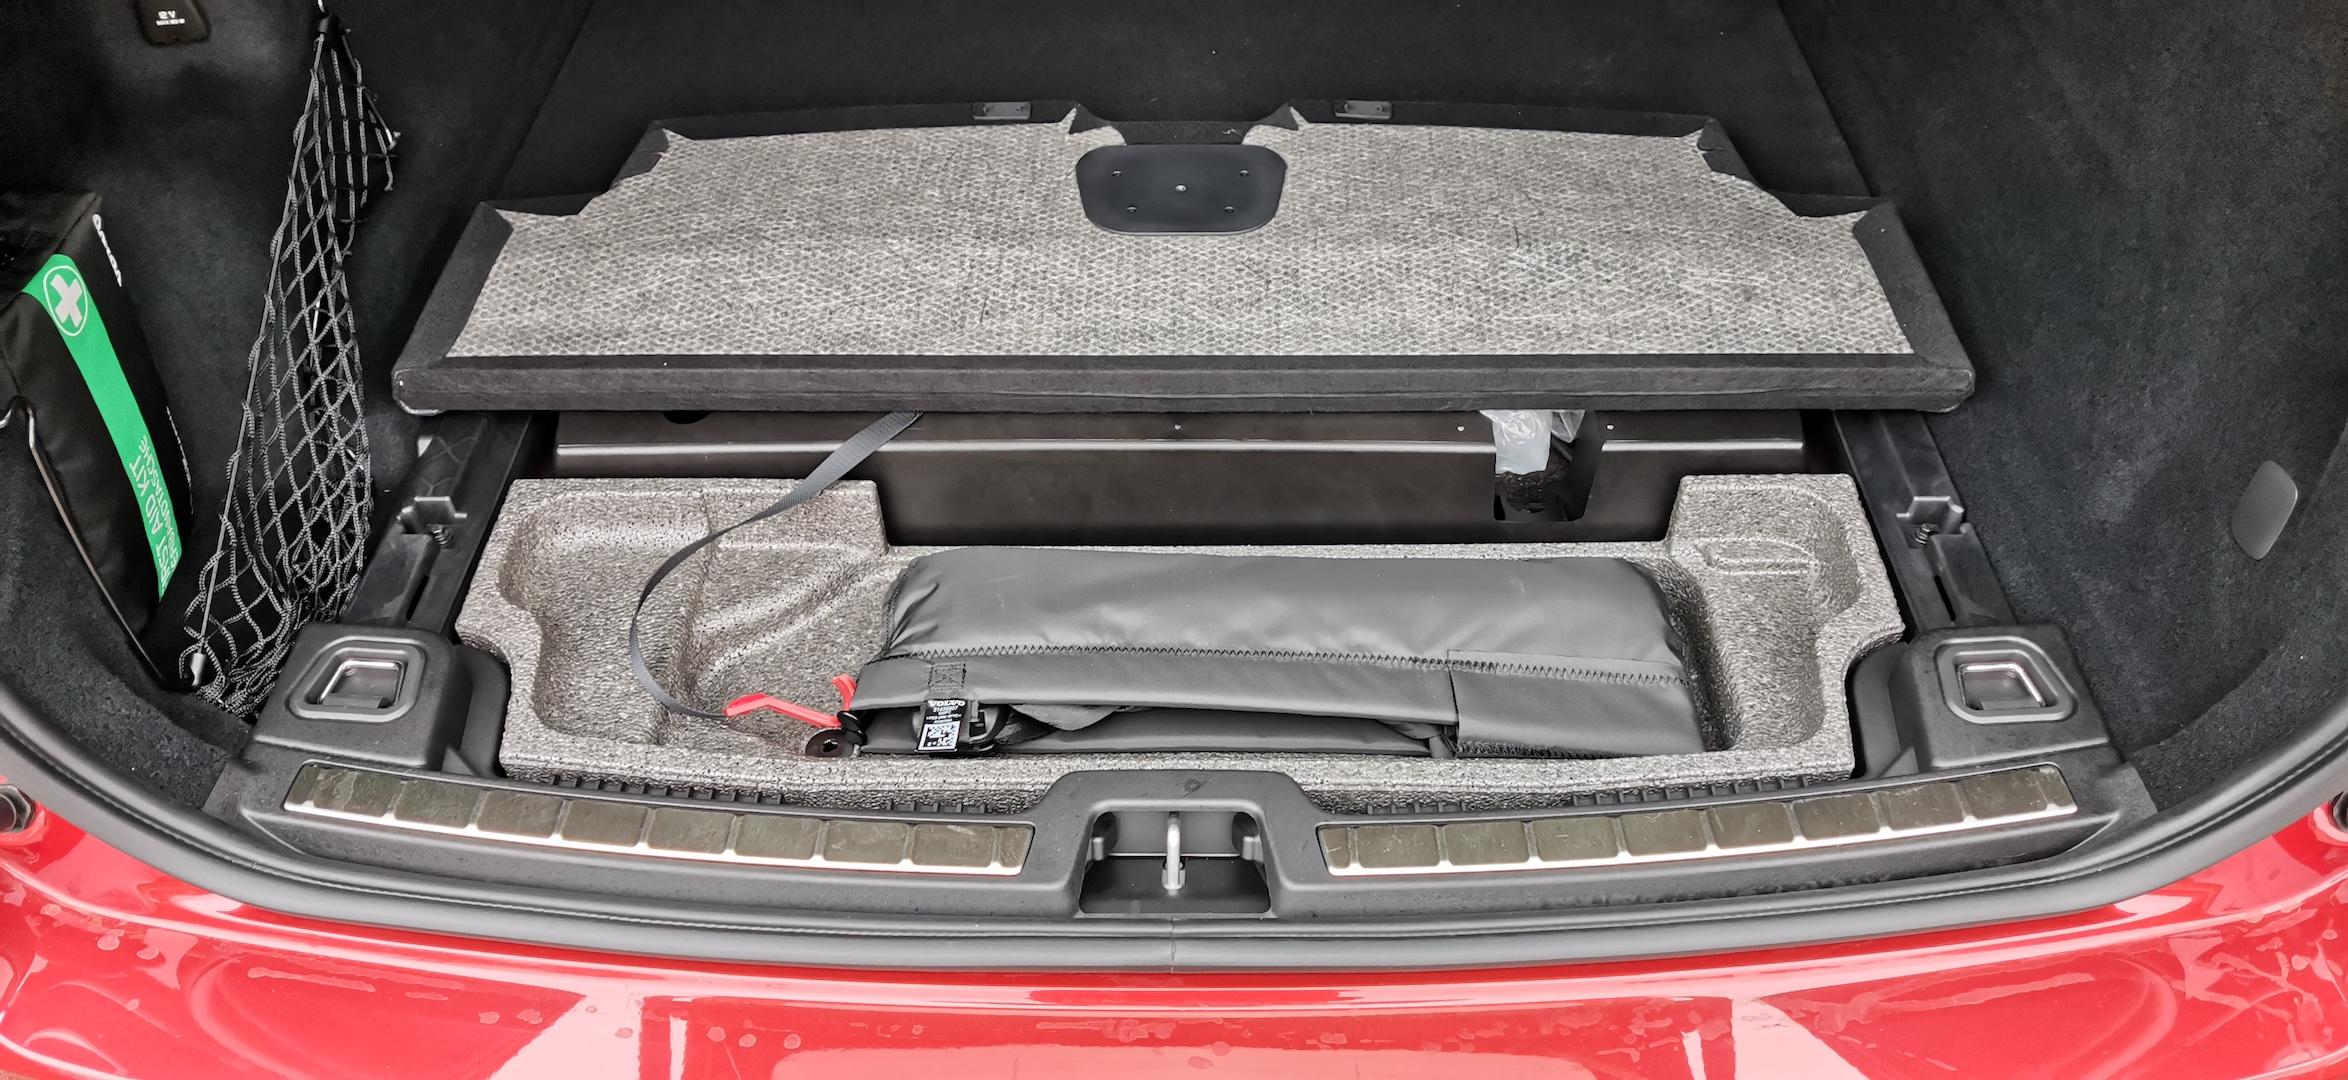 Volvo XC60 T6 AWD Recharge - pod kufrem